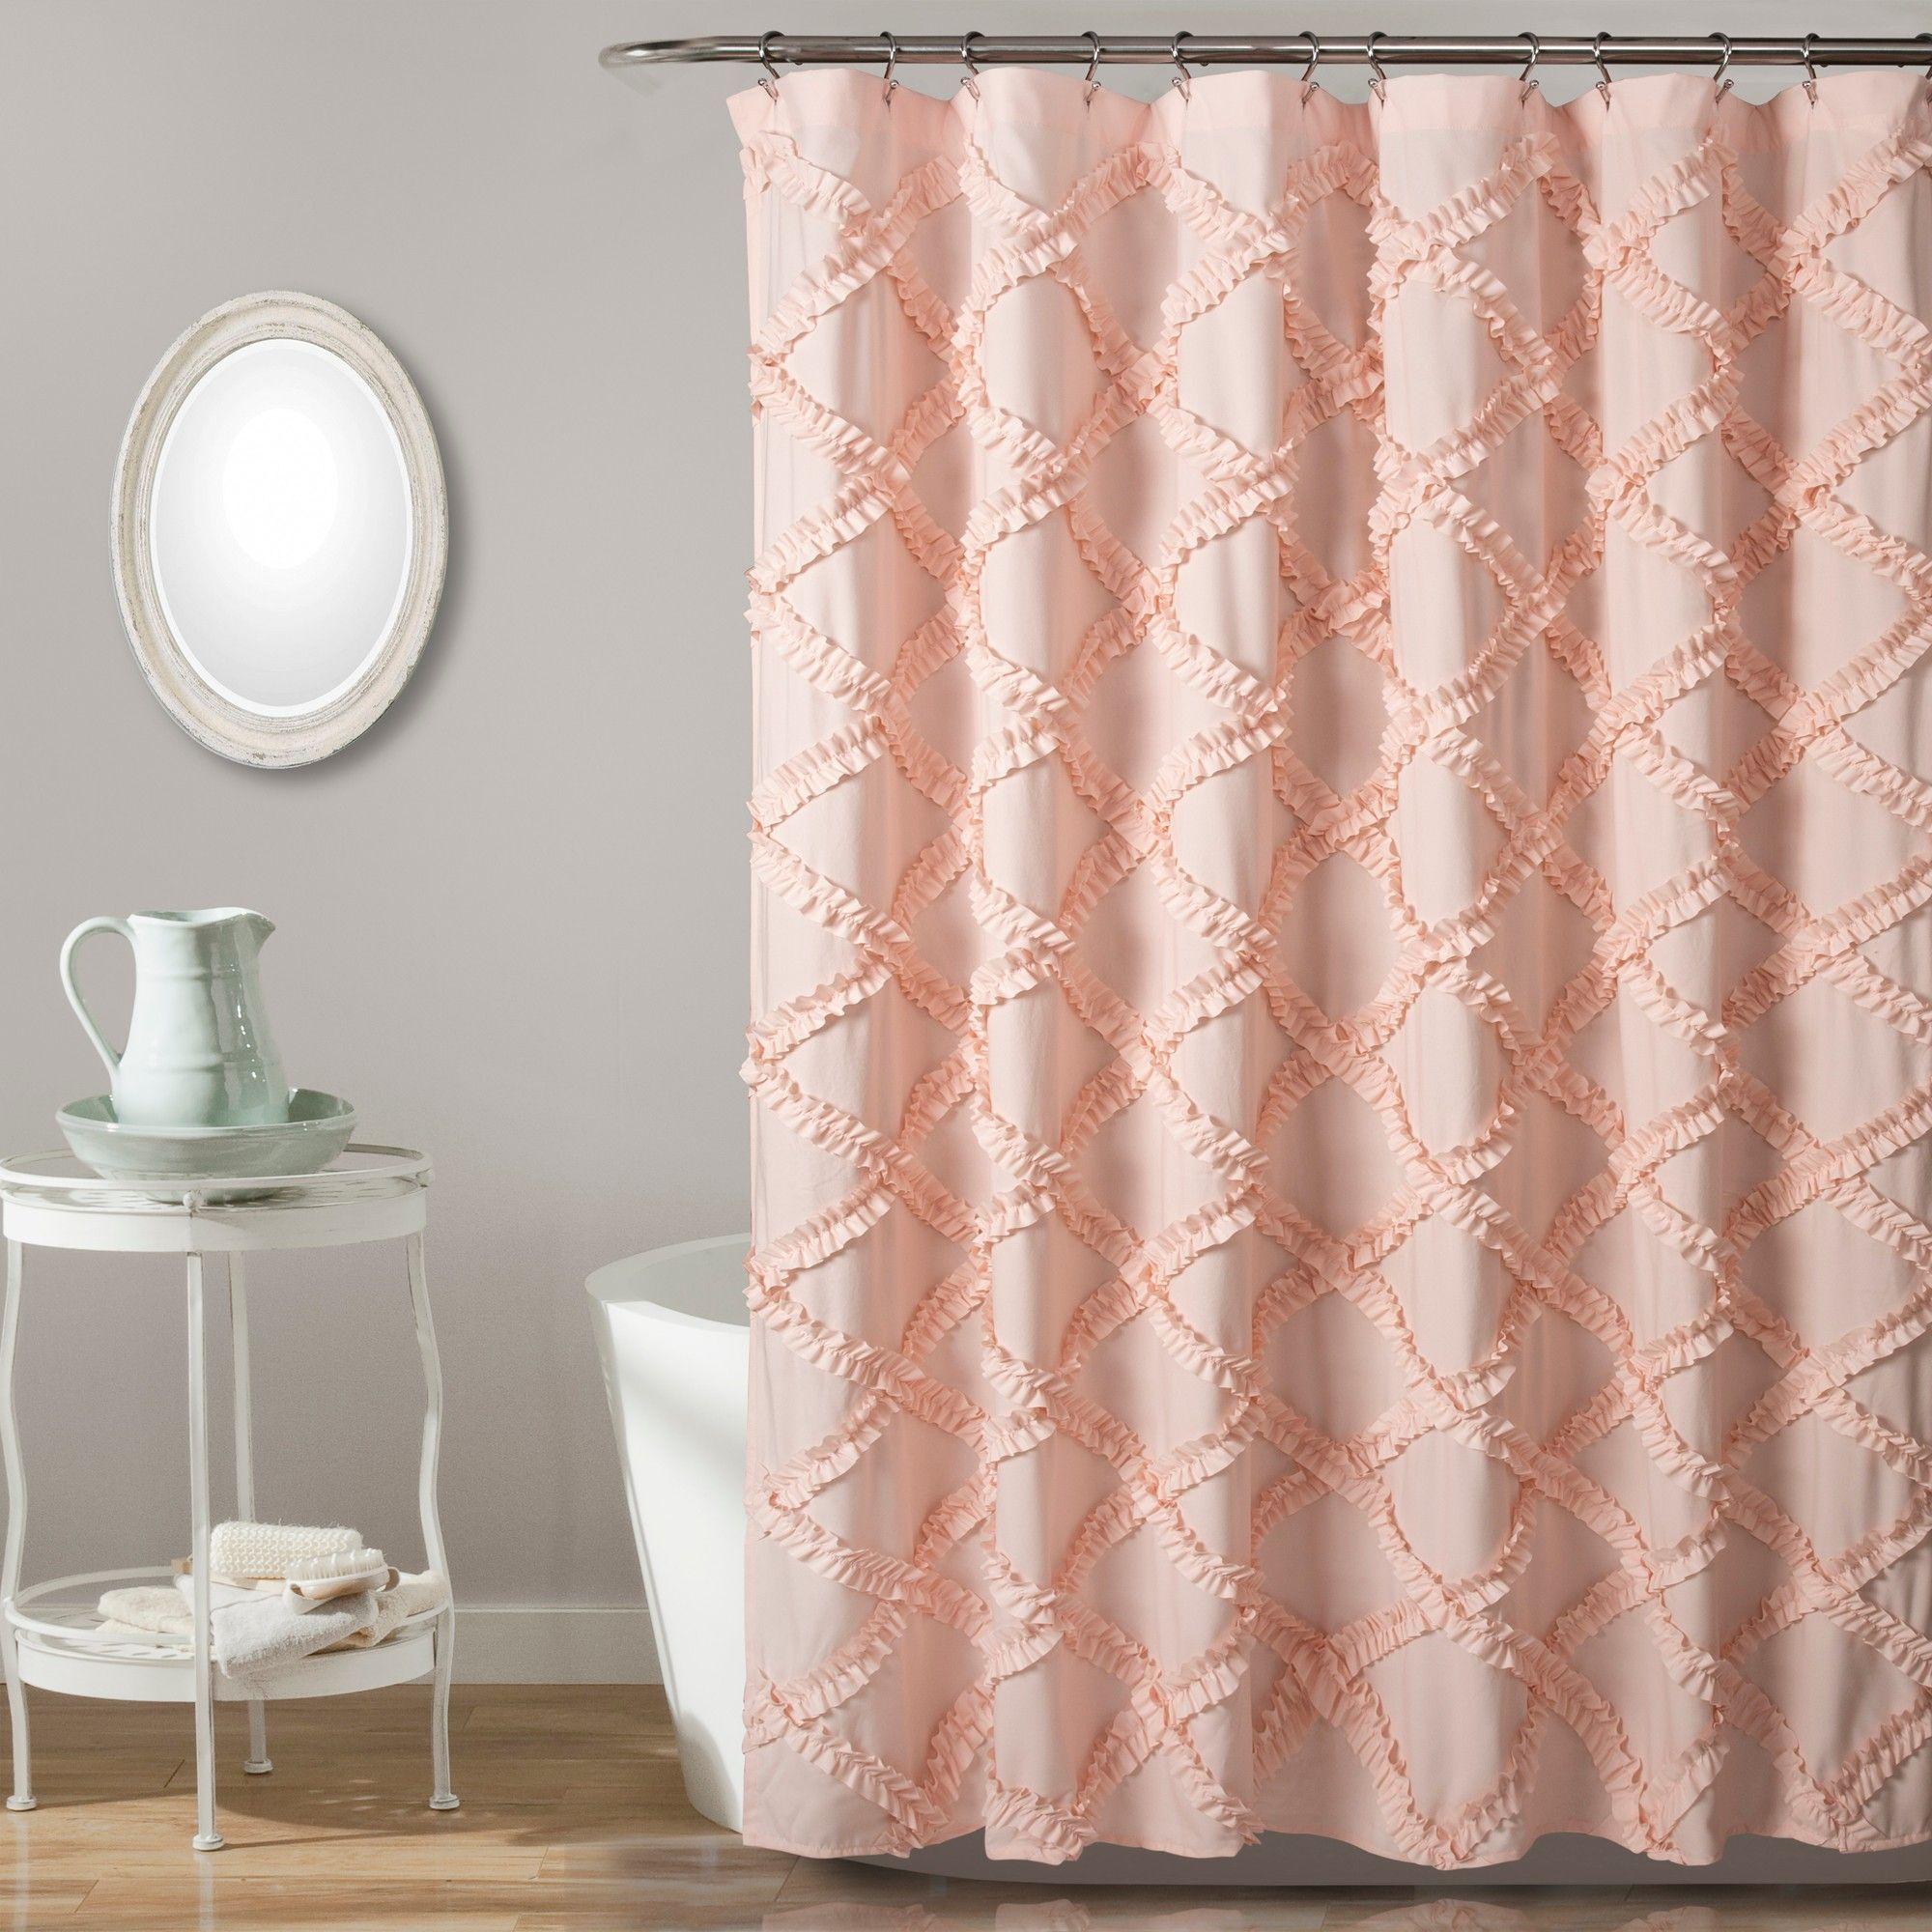 Ruffle Diamond Shower Curtain Blush Pink Lush Decor Ruffle